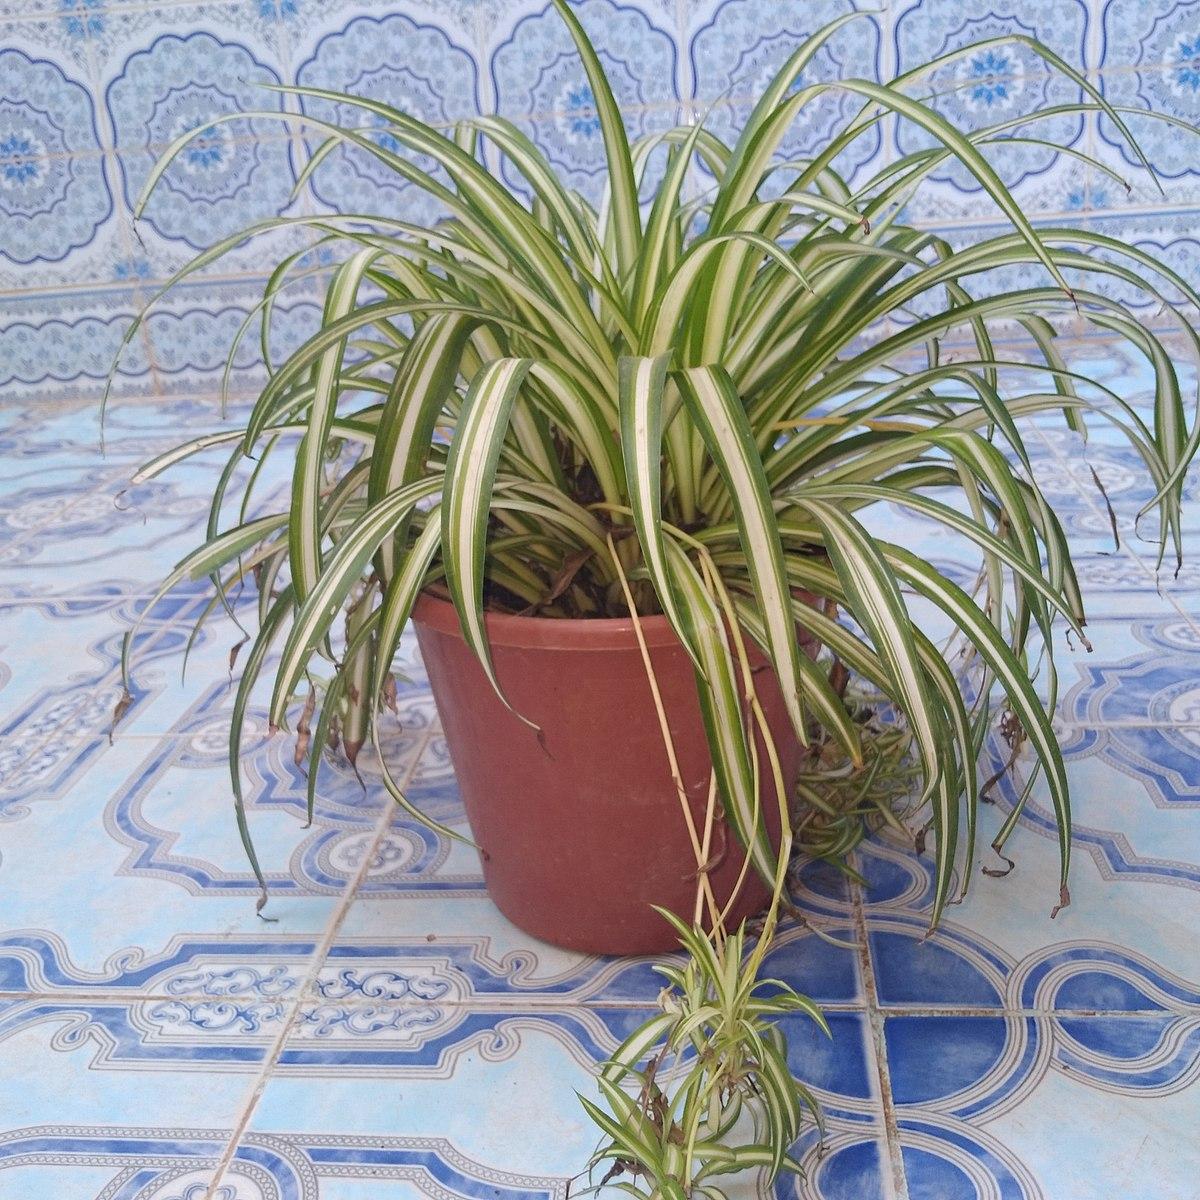 Fichier Une Petite Plante Verte Dans La Maison Jpg Wikipedia